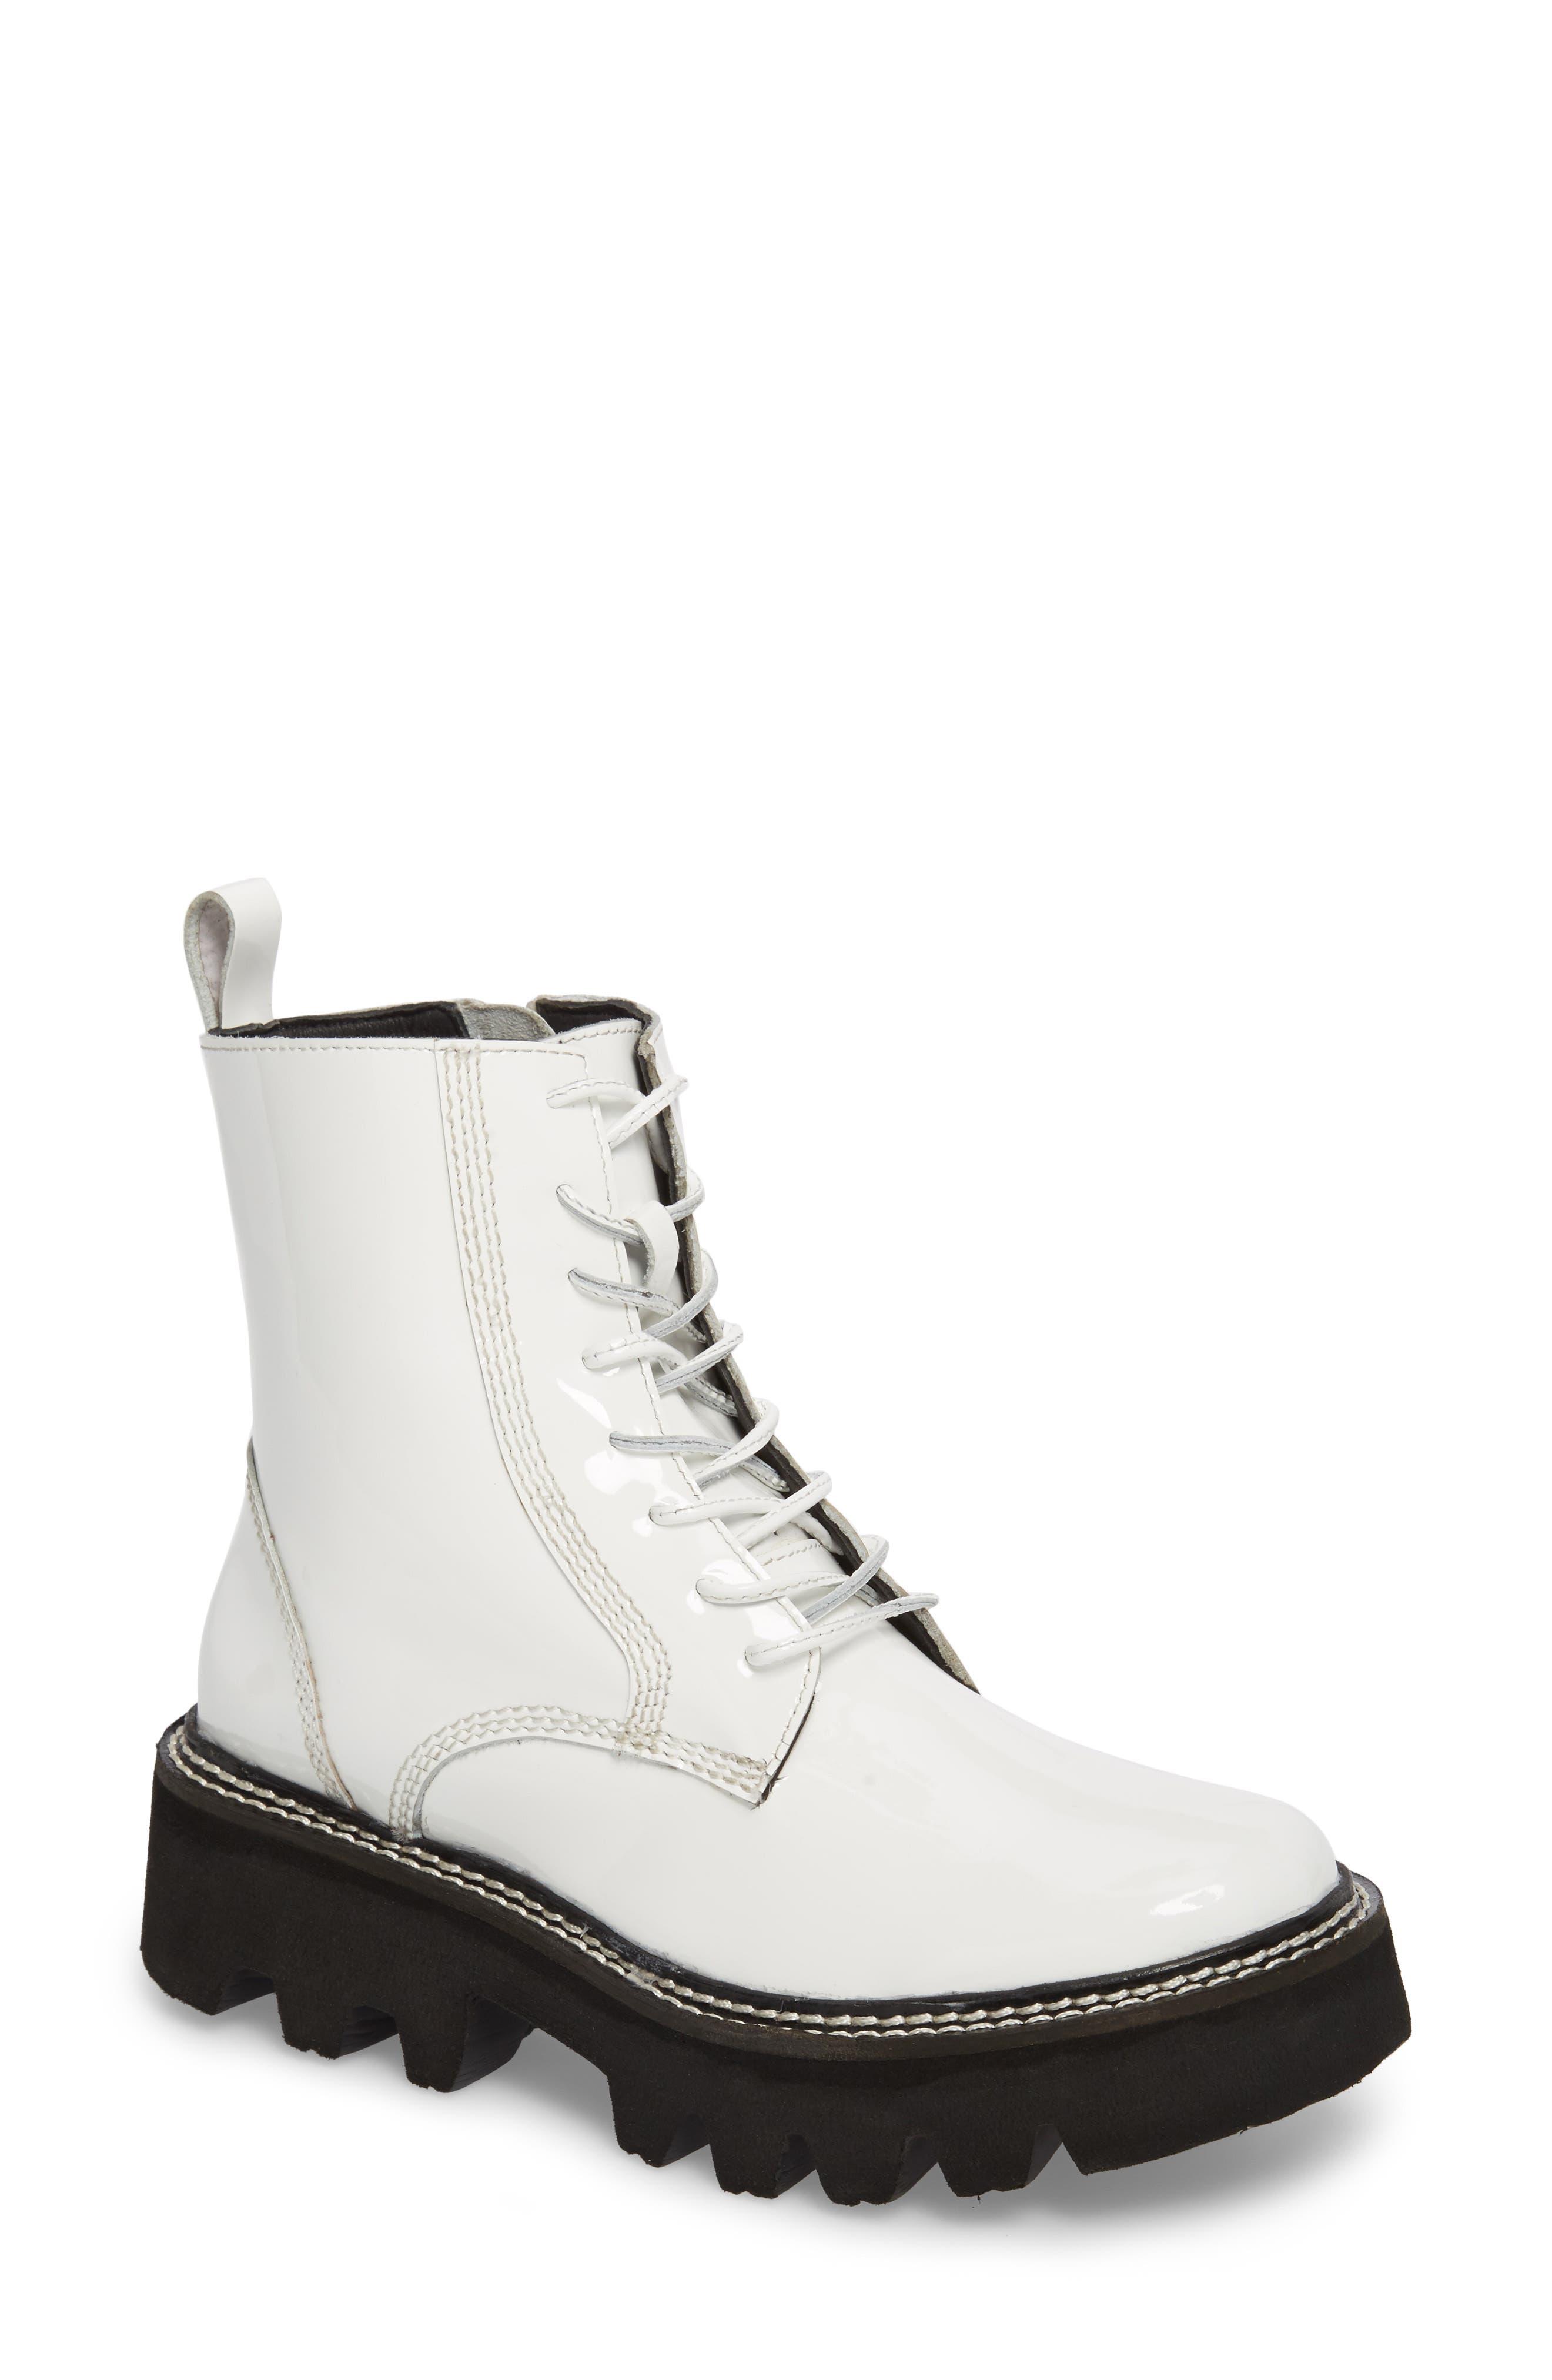 Agira Lug Boot,                         Main,                         color, White Patent Leather